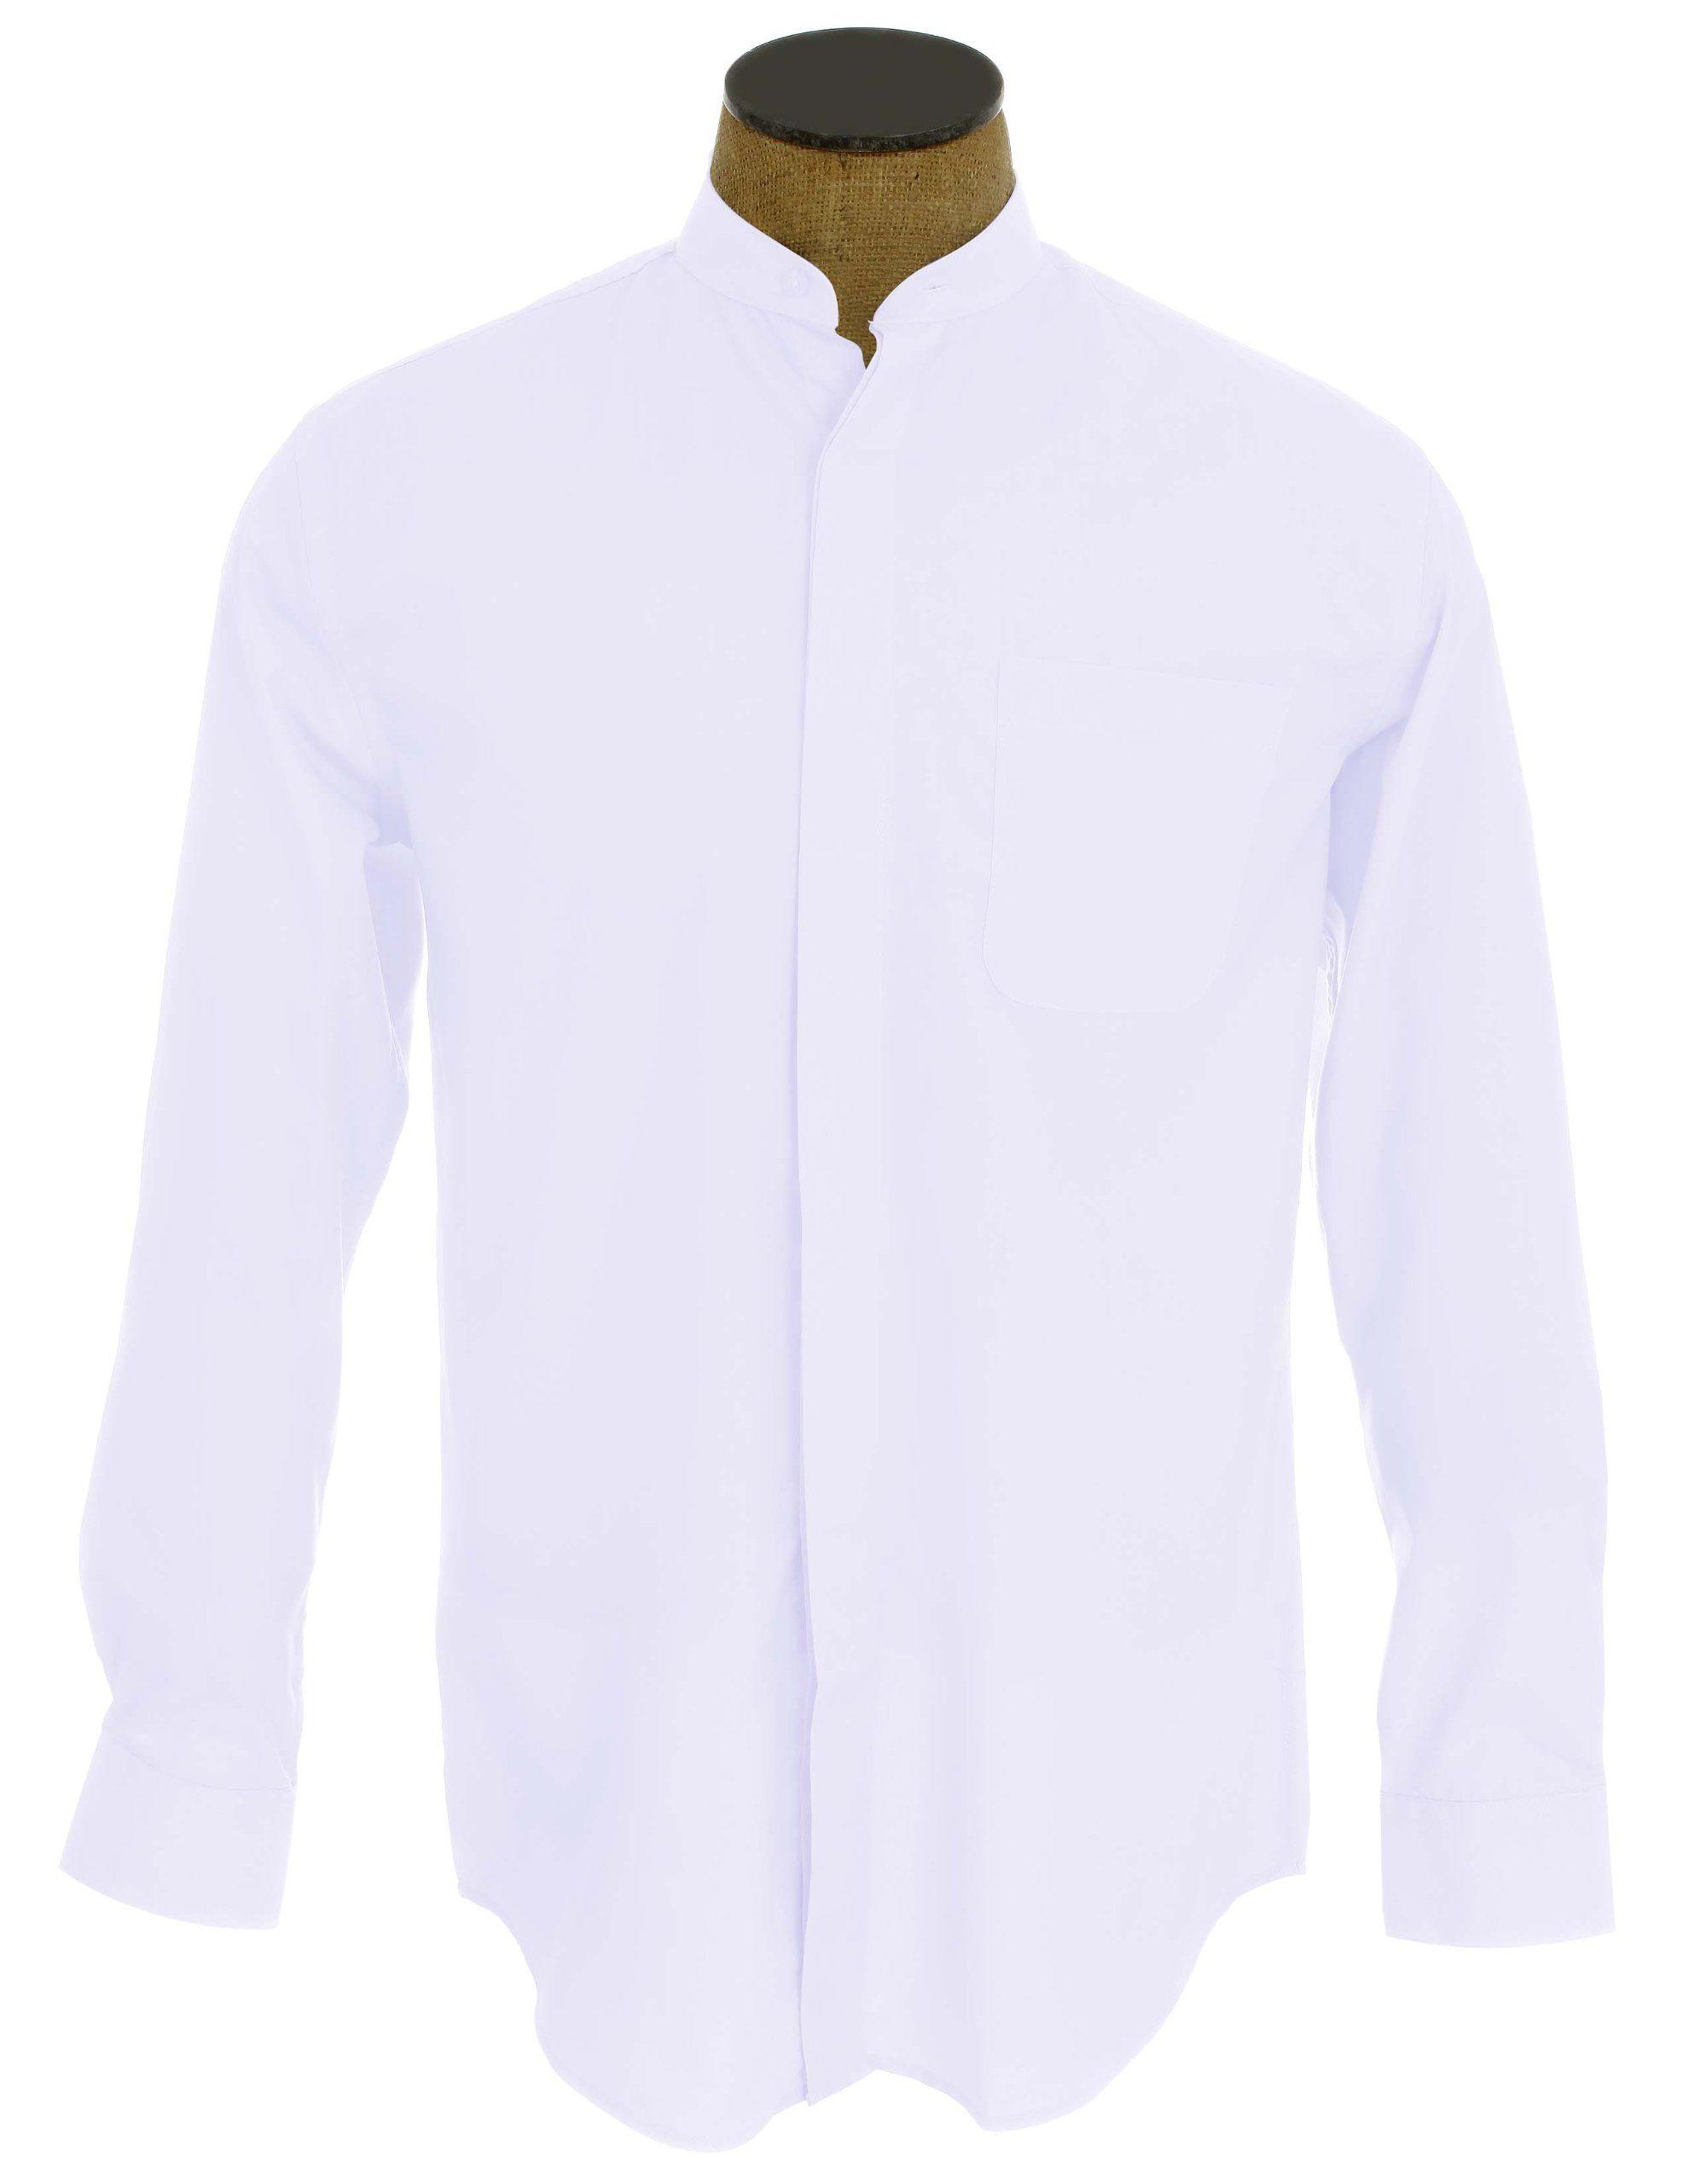 Men 39 s collarless banded collar dress shirt white 17 5 36 for Collarless white shirt slim fit